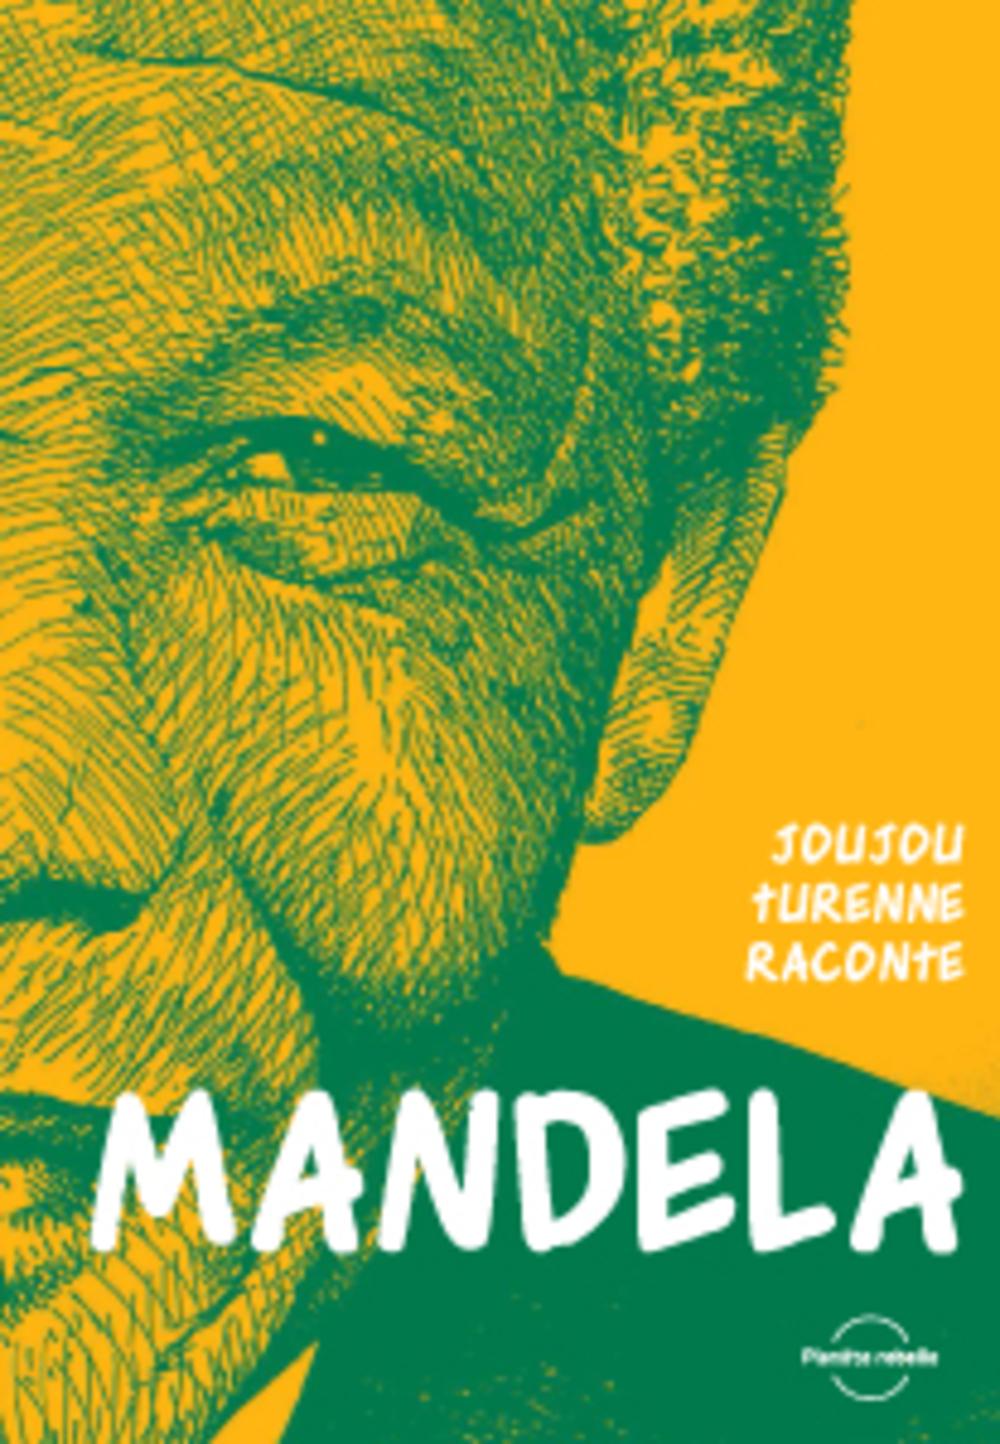 Joujou Terenne raconte Mandela